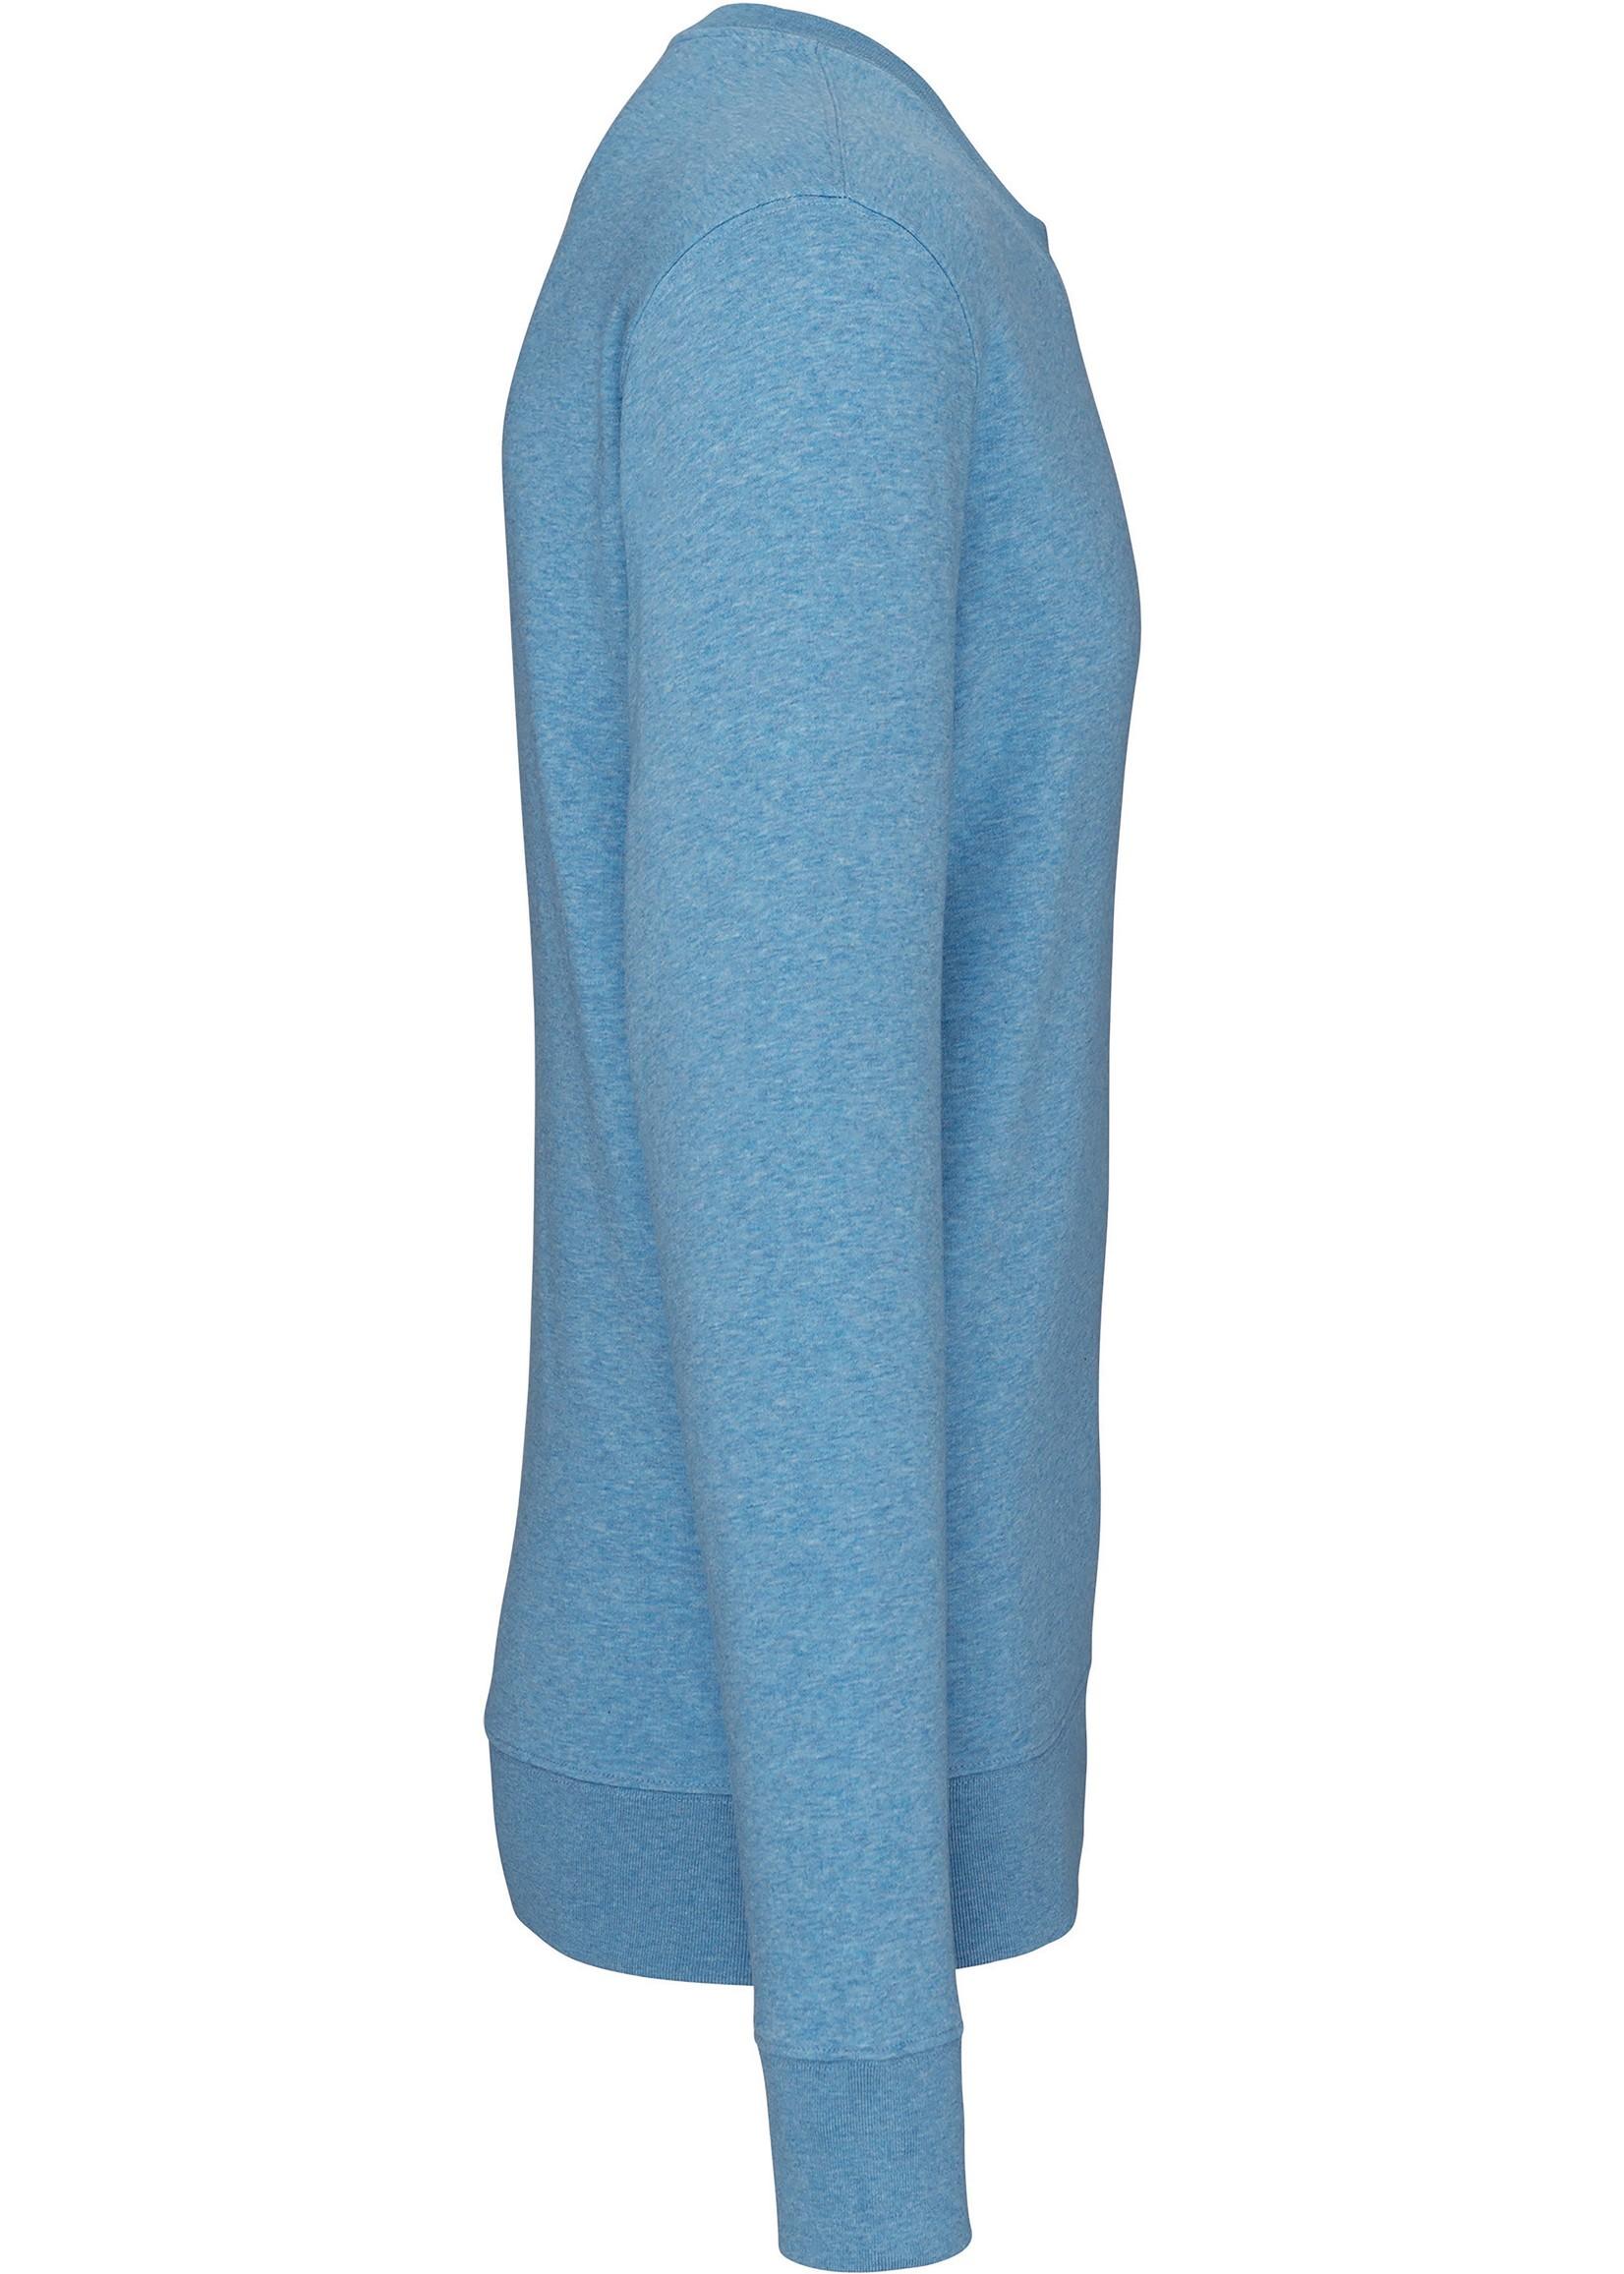 Eco-Friendly Sweater UNI Cloudly-Blue Gemêleerd